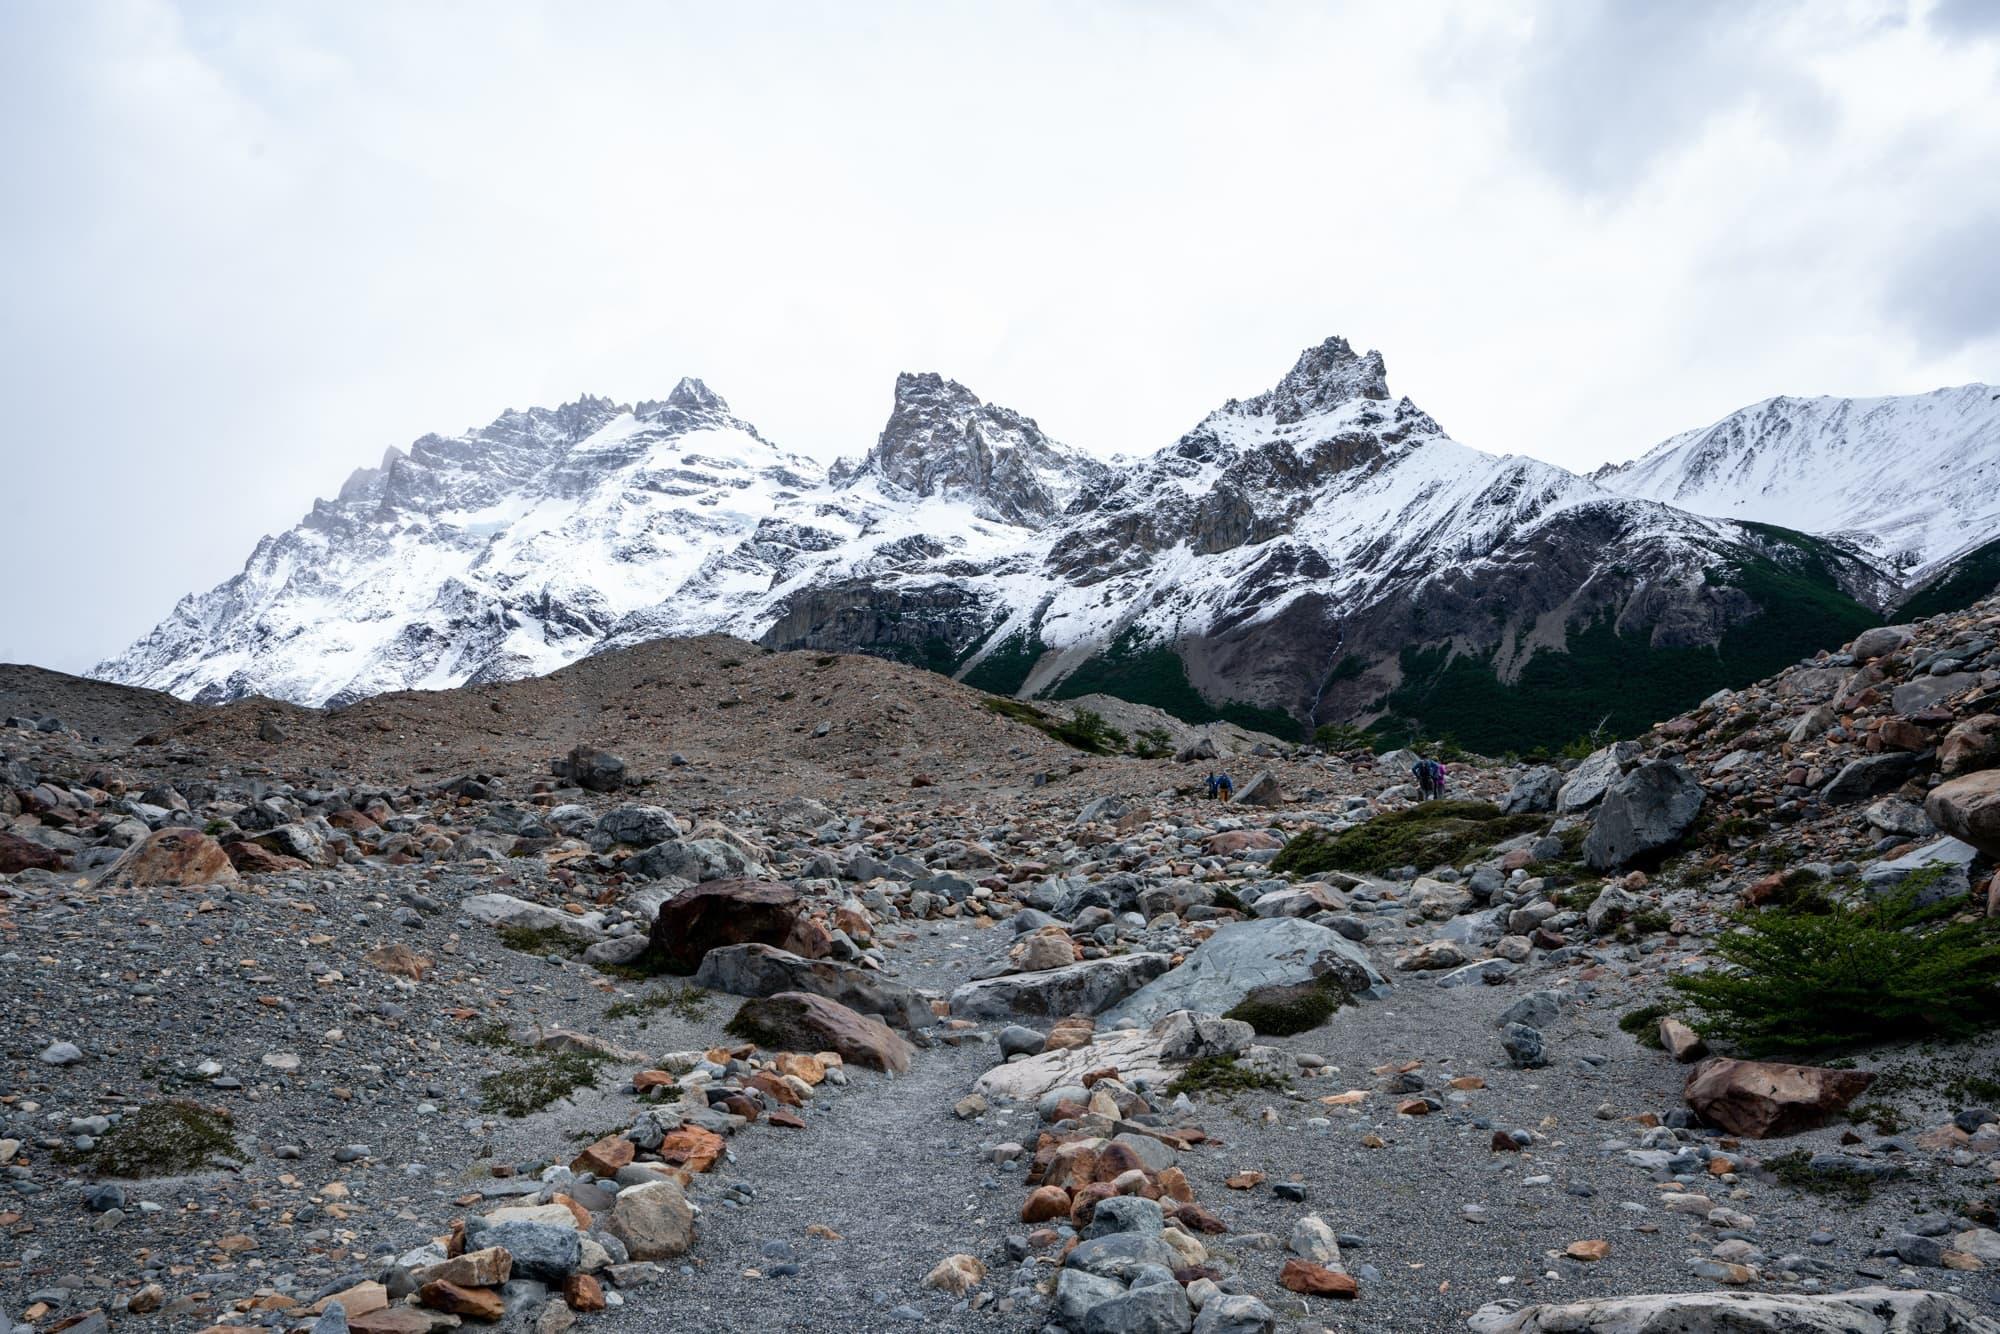 Hiking to Cerro Torre in El Chalten (Patagonia)